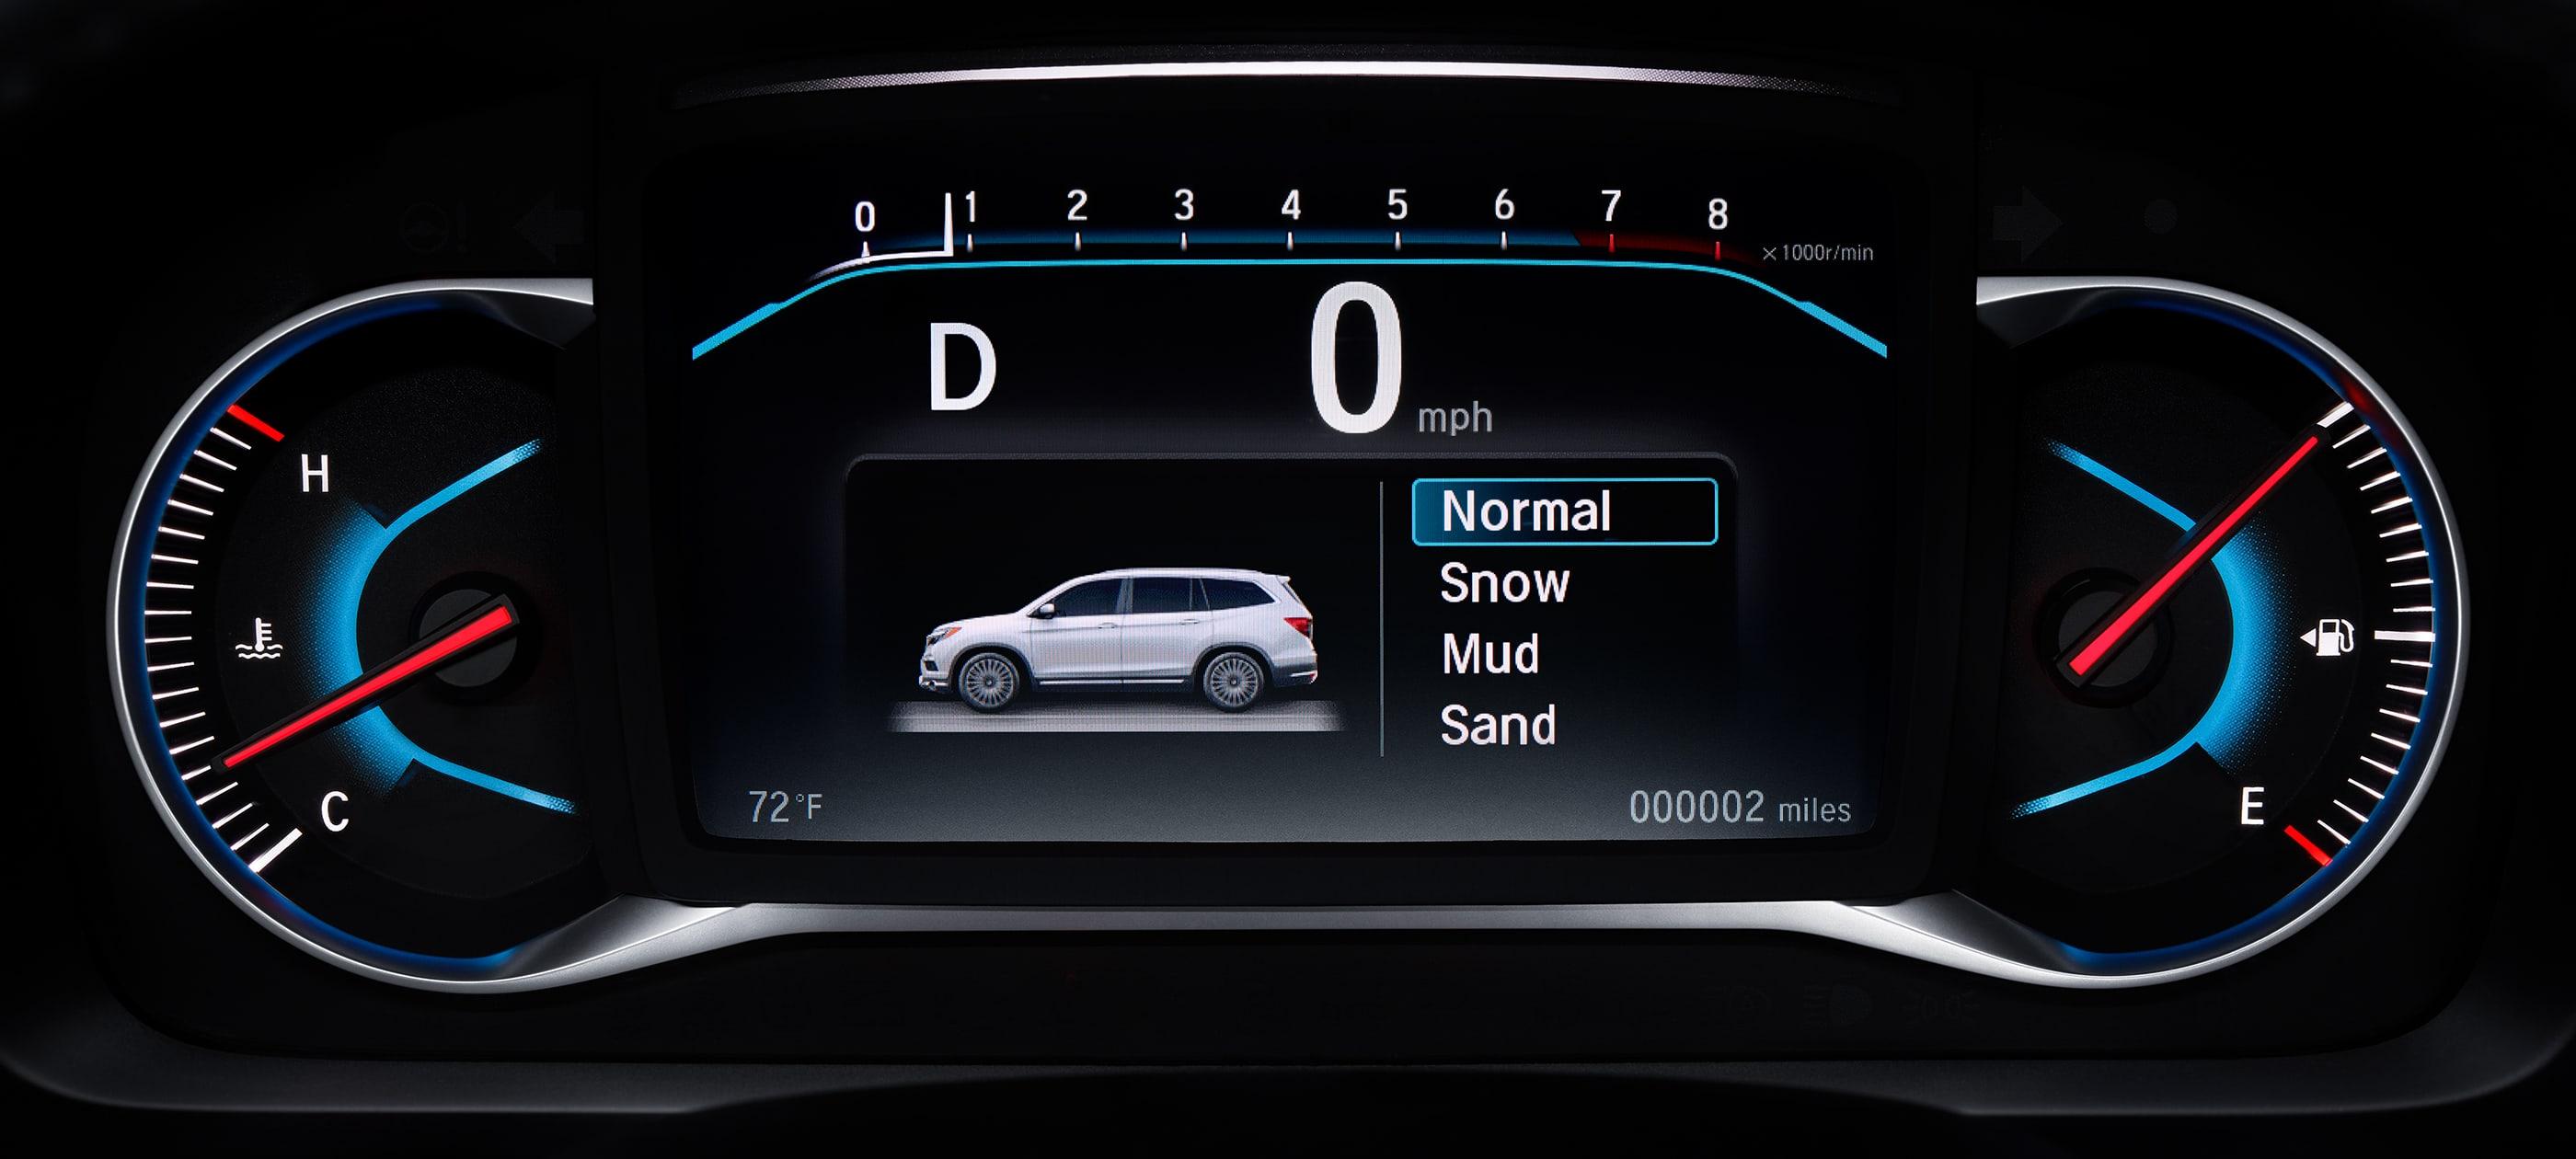 2020 Honda Pilot vs. 2019 Toyota Highlander Comparison | Honda